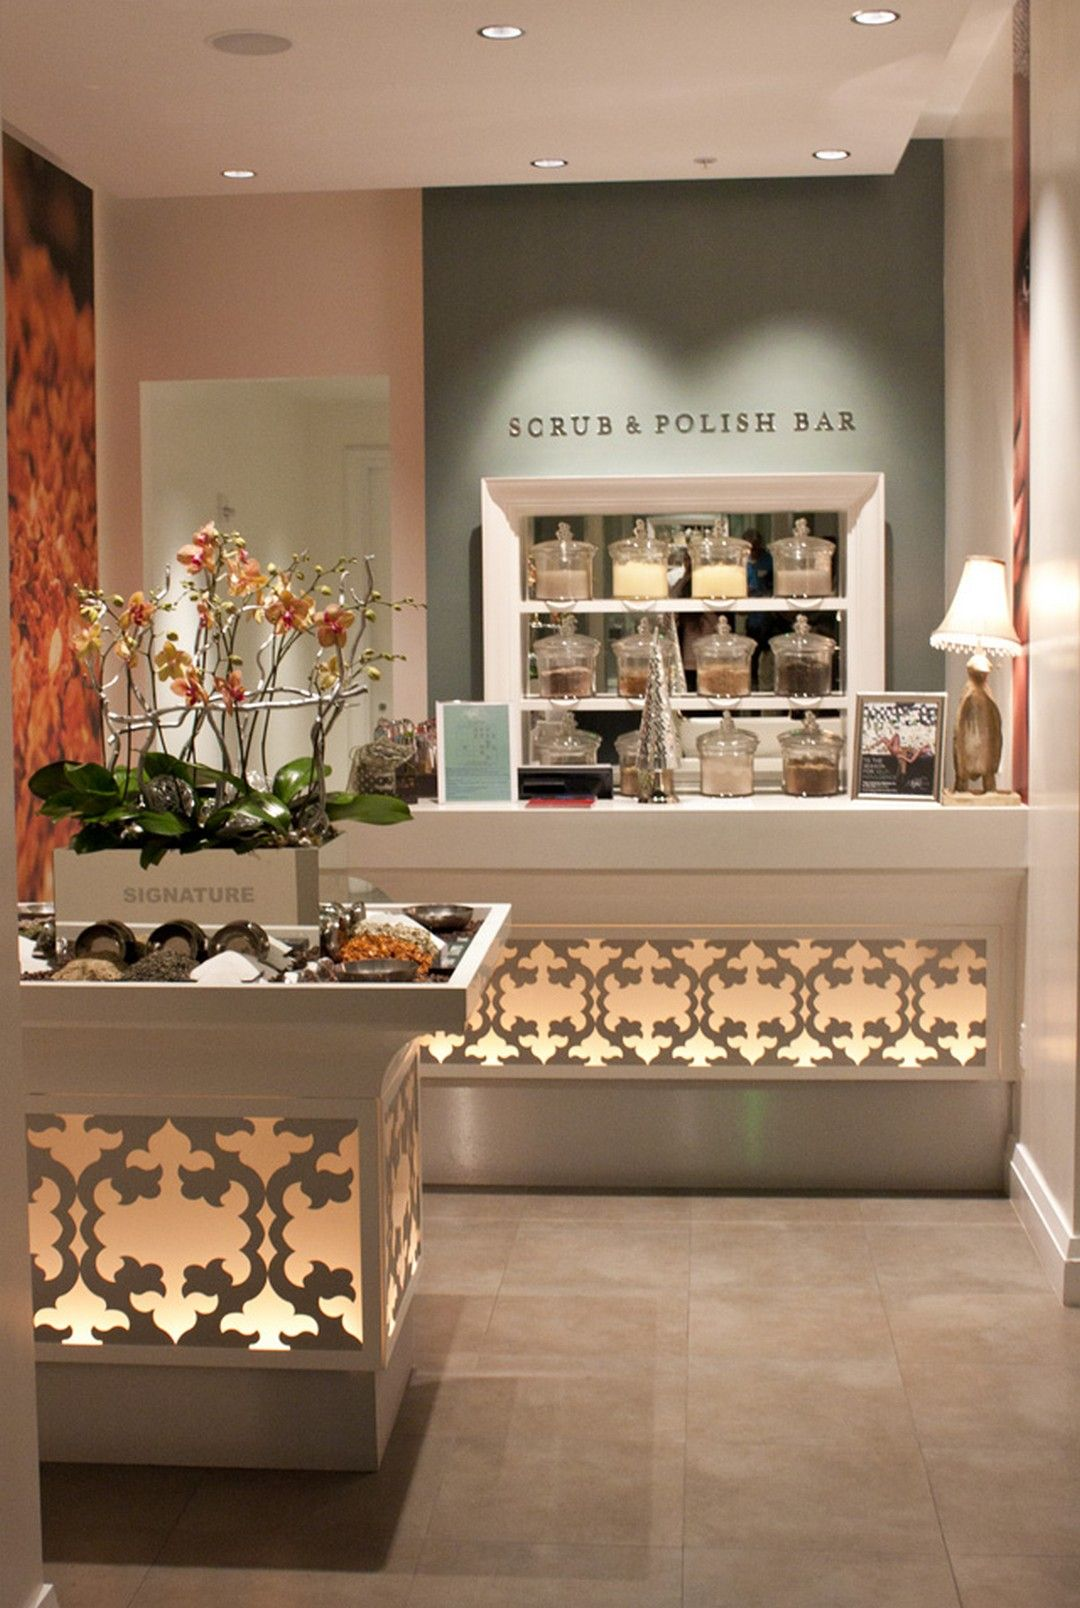 37 excellent indoor spa decorating ideas diy home decor deco spa salon d co salon - Diy deco salon ...